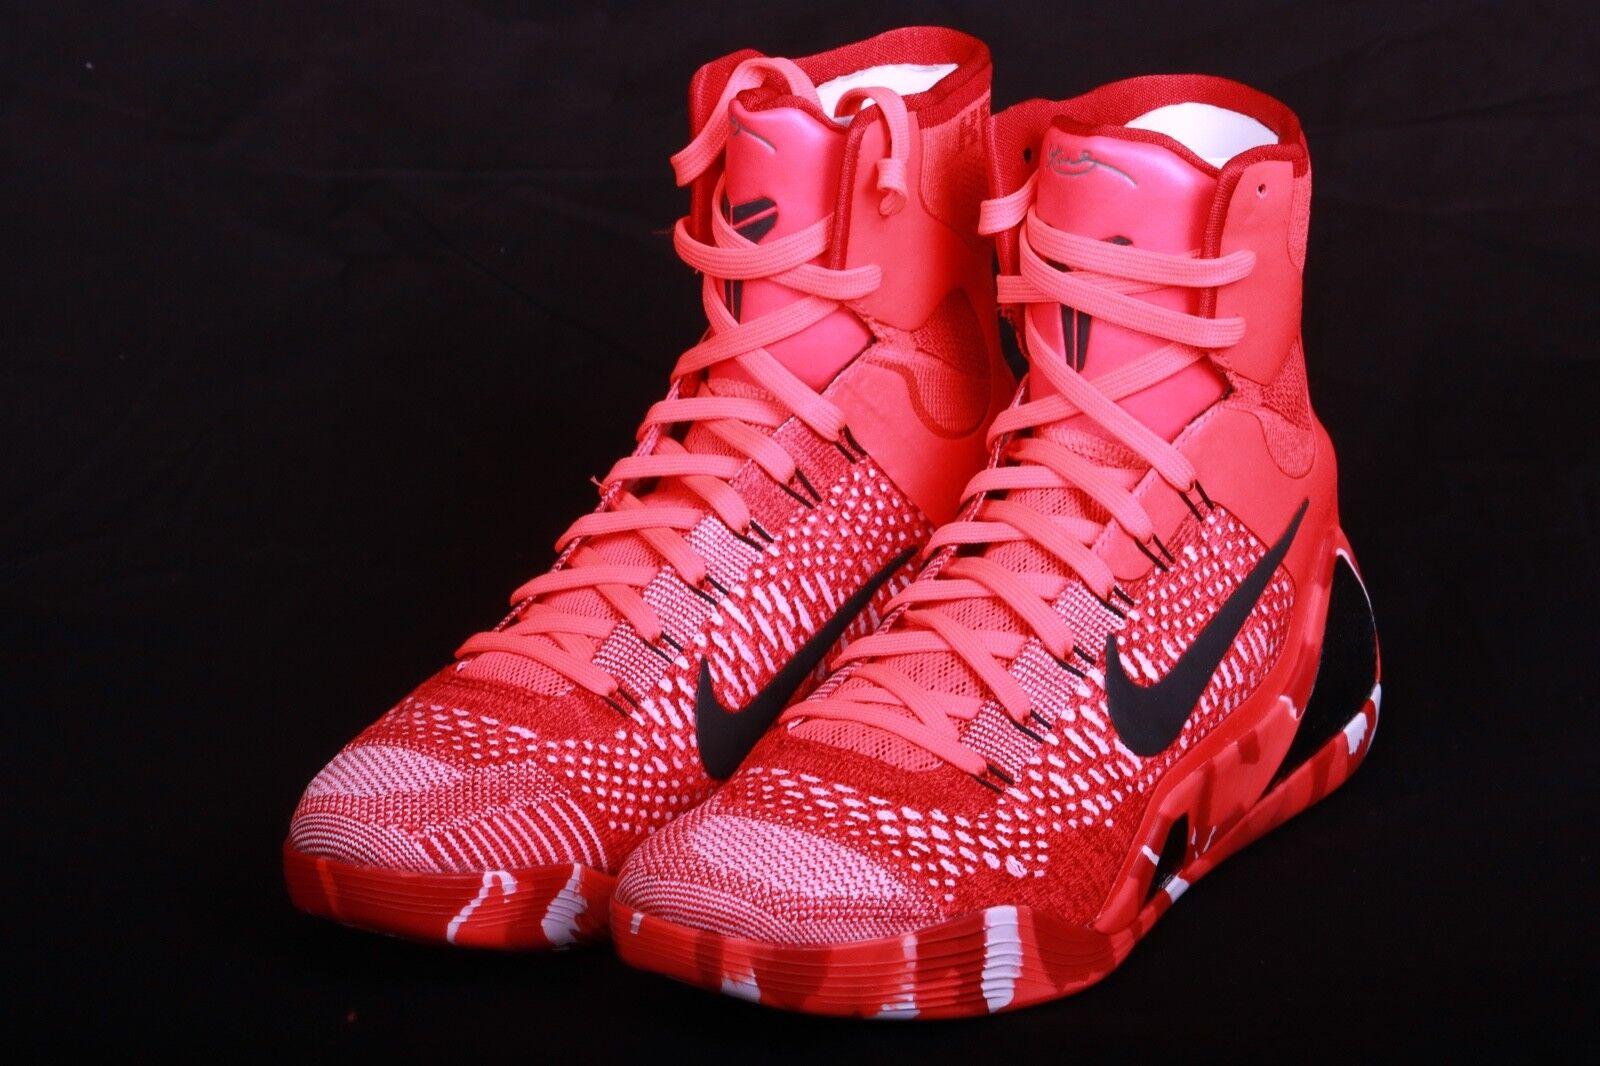 Nike Men's 2014 Kobe IX 9 Elite Christmas Bright Crimson shoes 630847 600 Sz 8.5